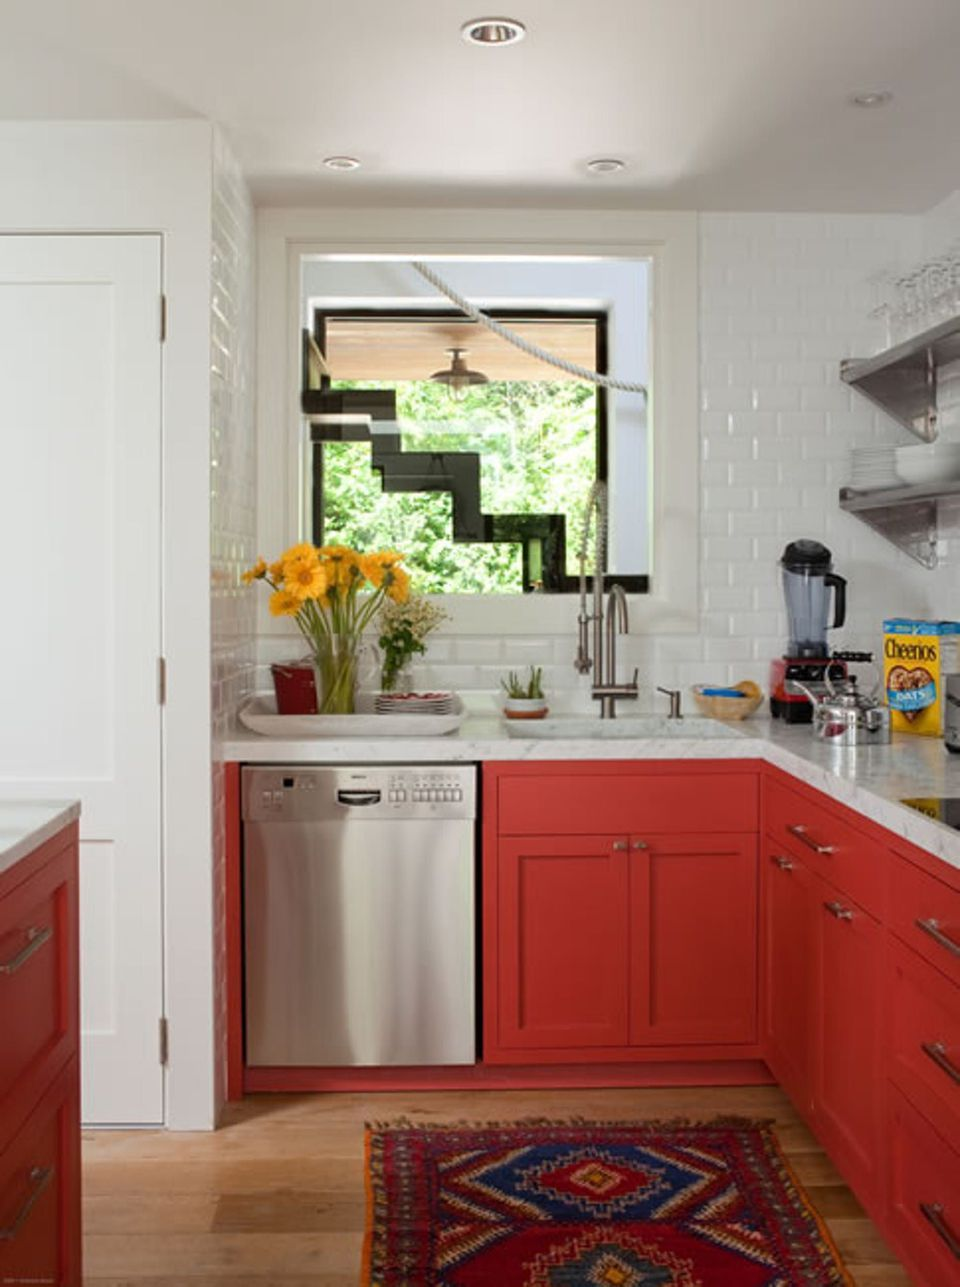 Red Metal Kitchen Cabinets 2020 In 2020 Kitchen Decor Sets Small Apartment Kitchen Red Kitchen Cabinets